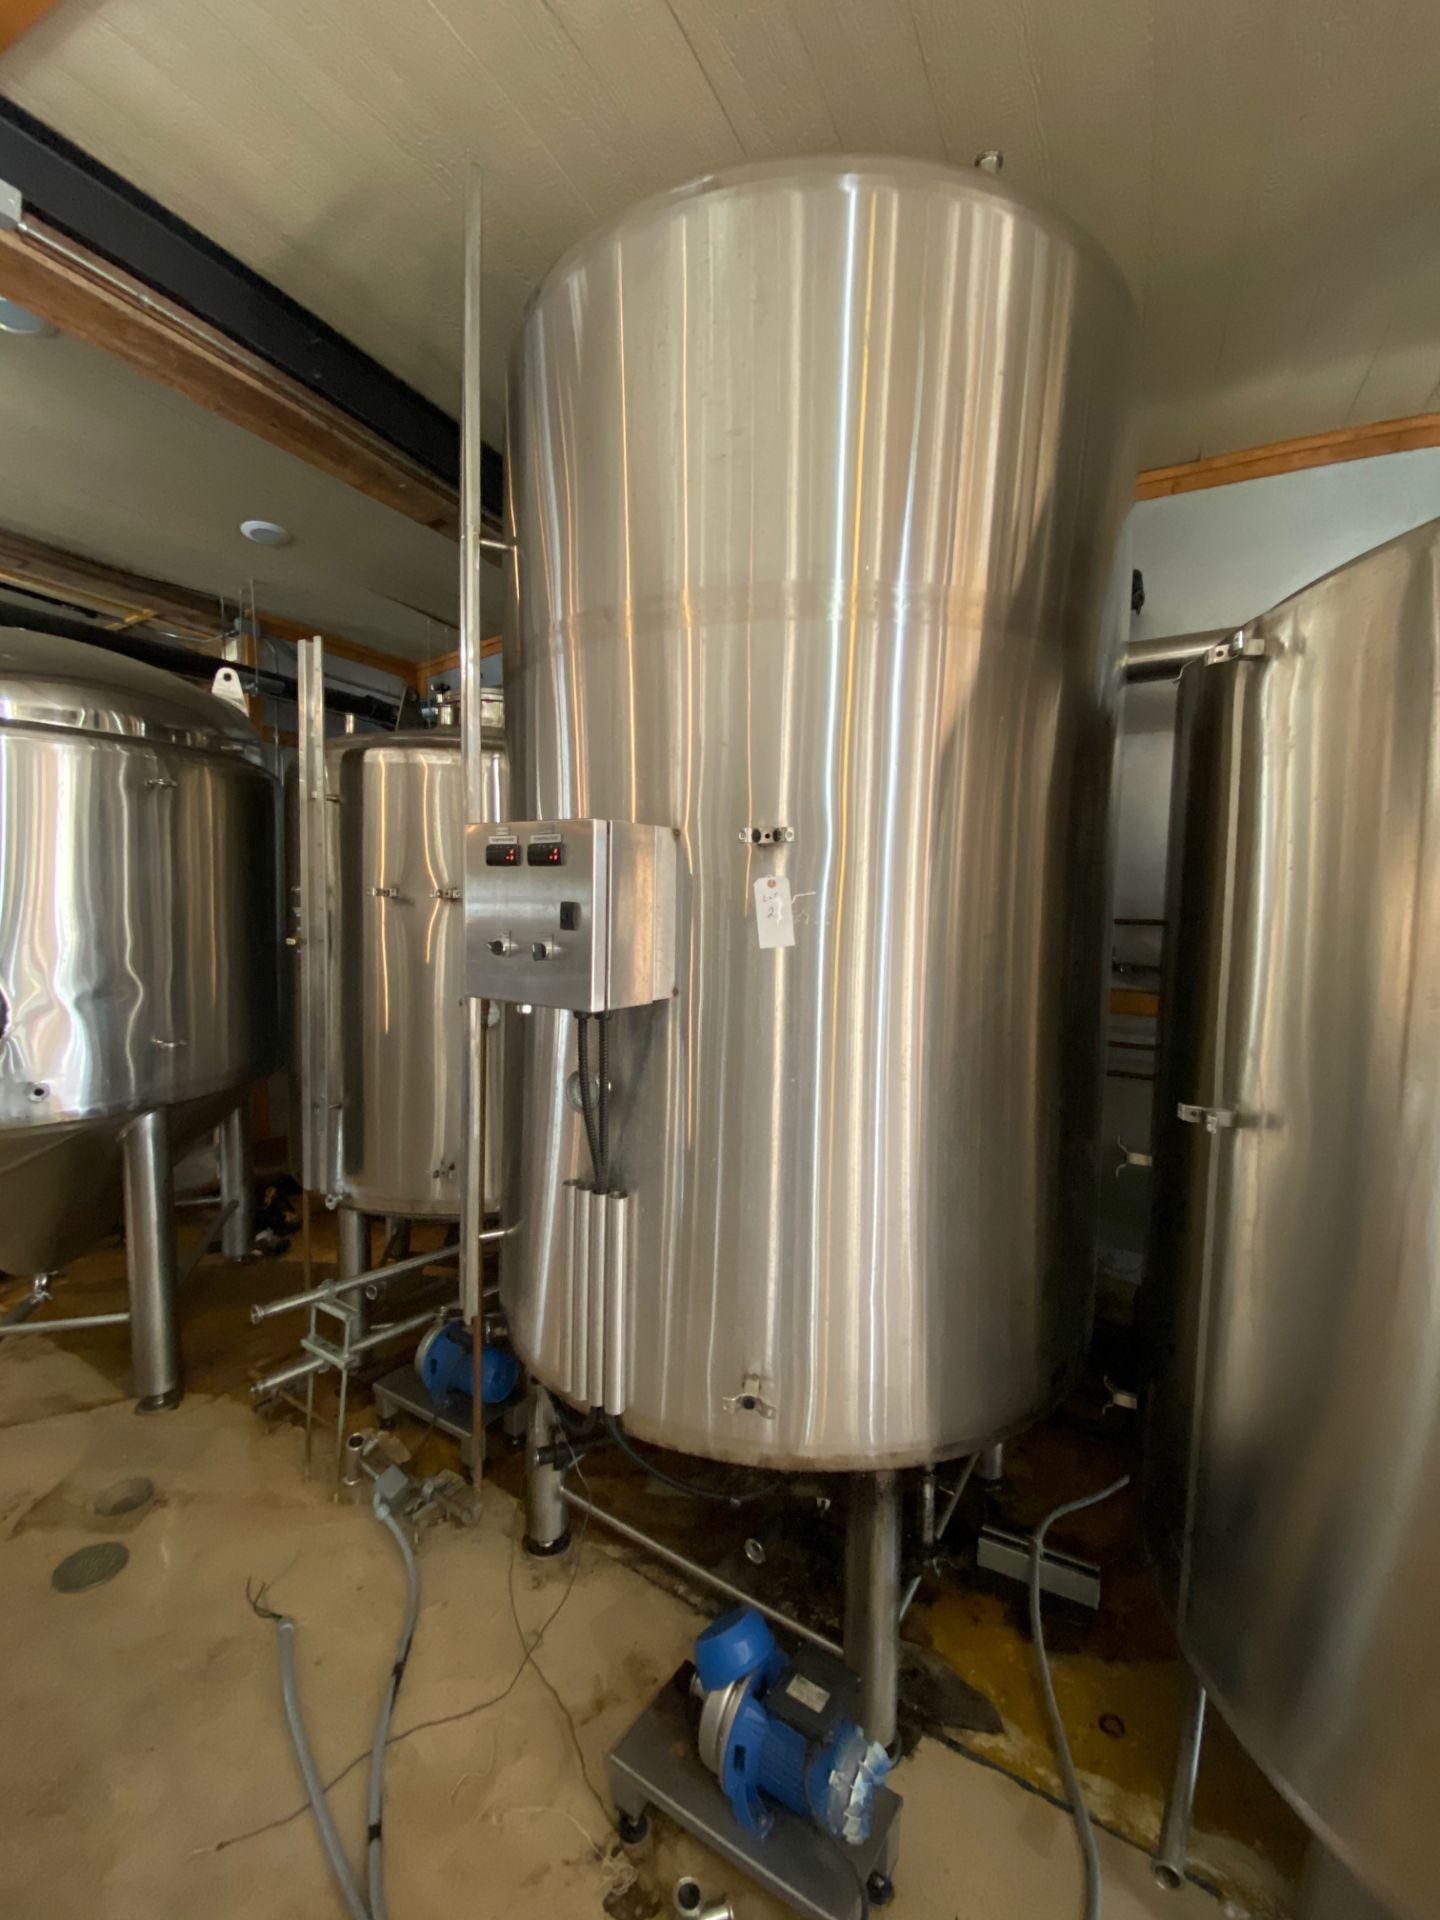 Lot 2 - 2014 Criveller Hot Liquor Tank, Jacketed, Control Panel | Sub to Bulk | Rig Fee: $600